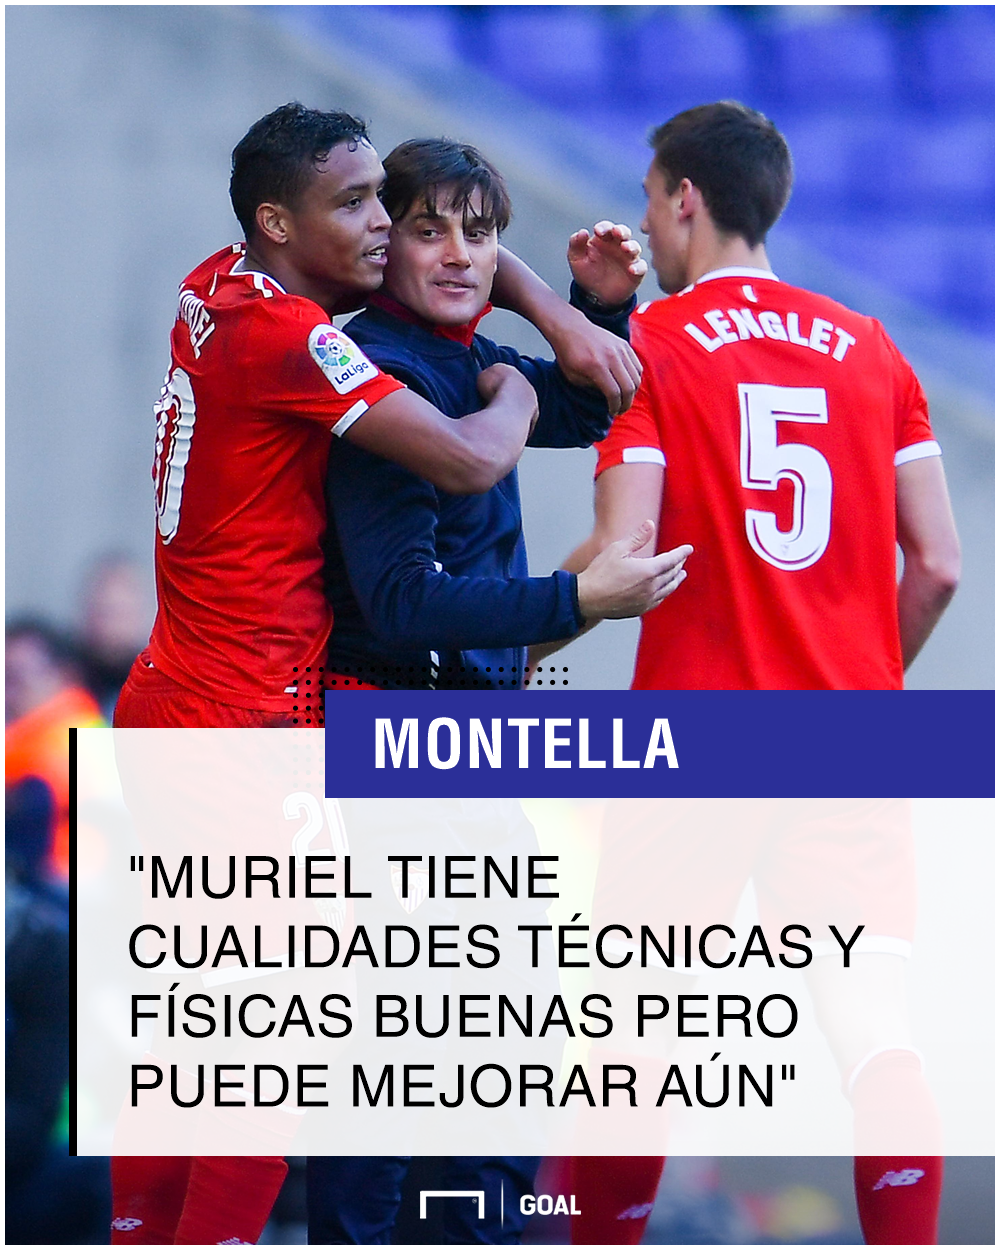 Montella sobre Muriel